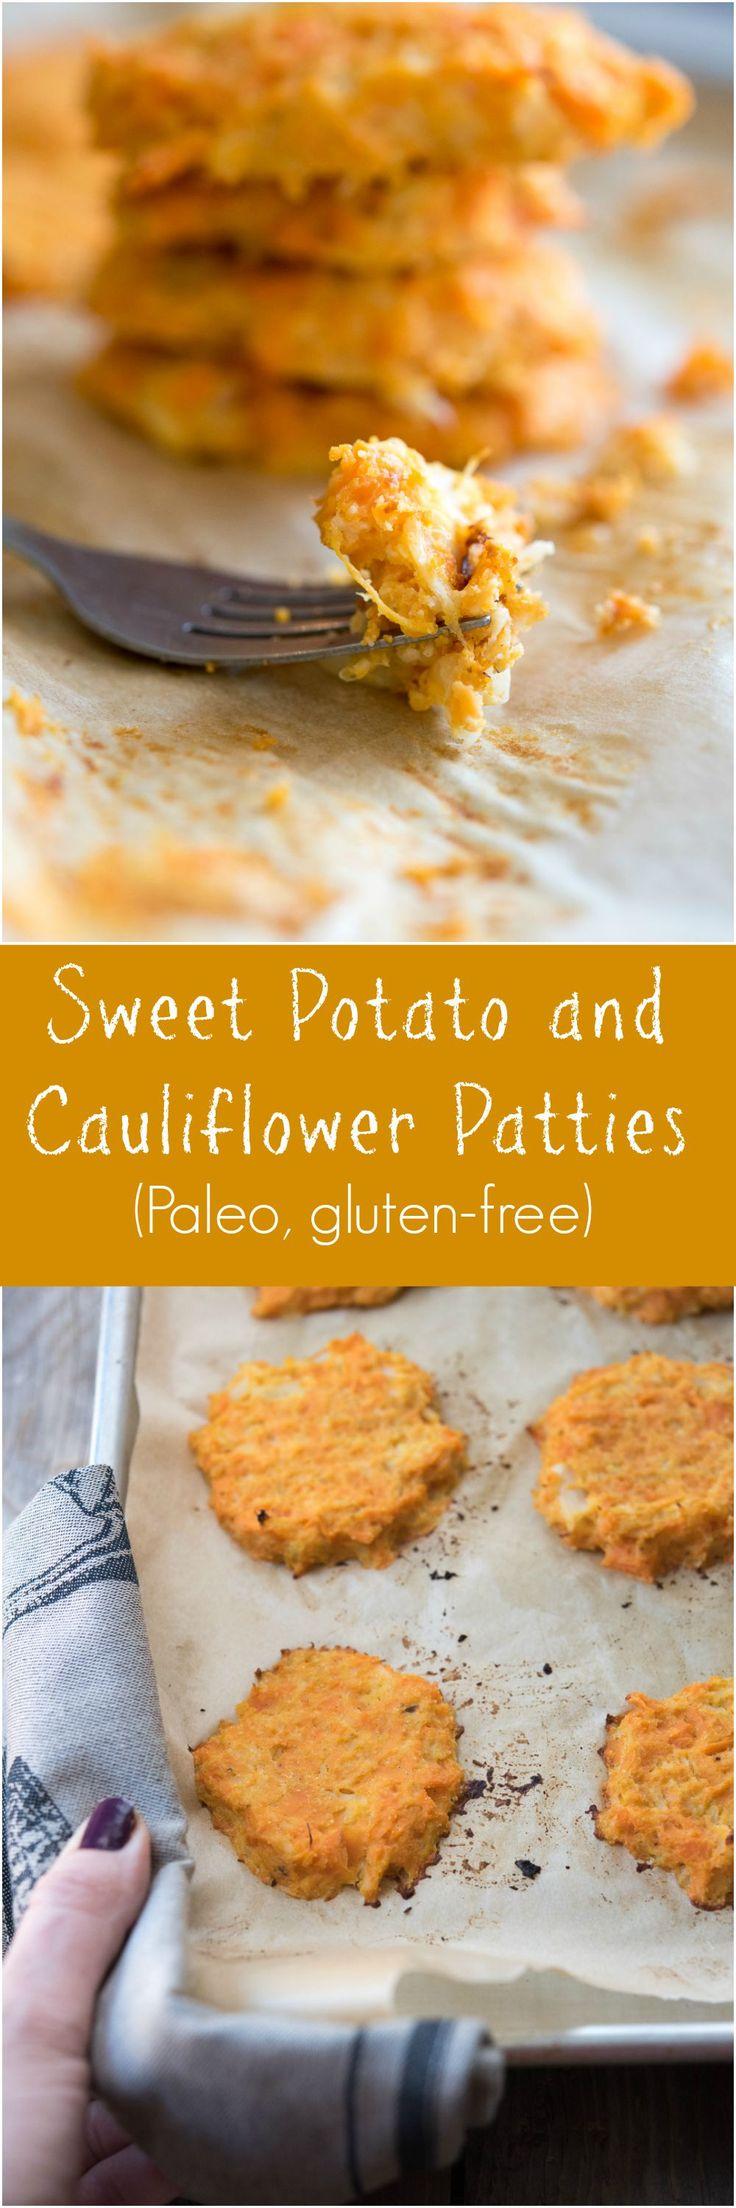 Sweet Potato and Cauliflower Patties - a Paleo and gluten-free side dish recipe on Thriving On Paleo